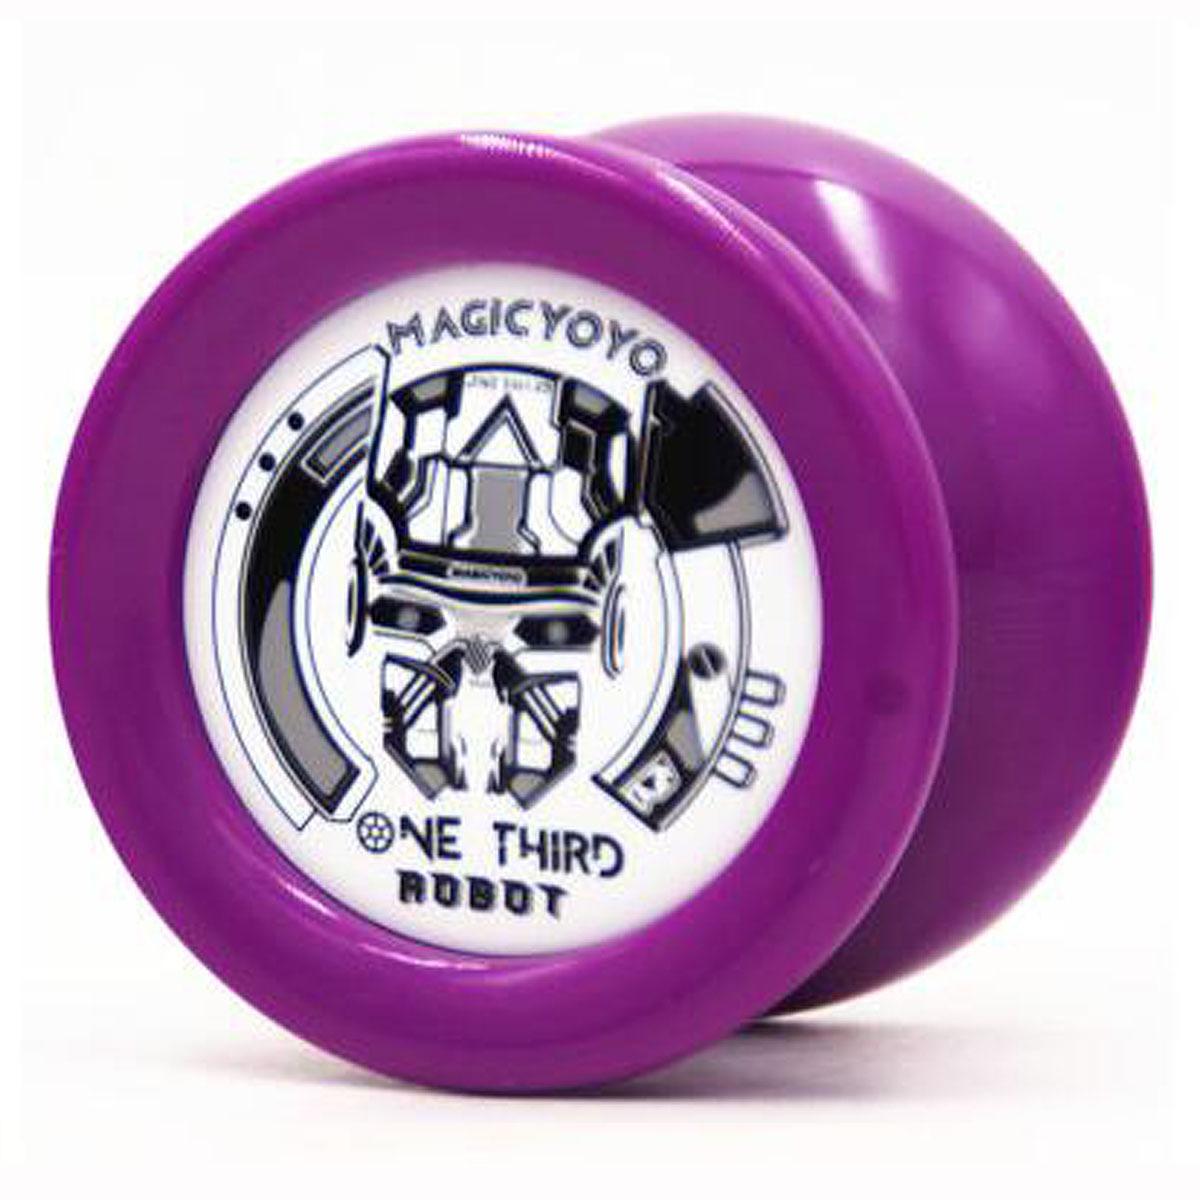 Magicyoyo D2 One Third